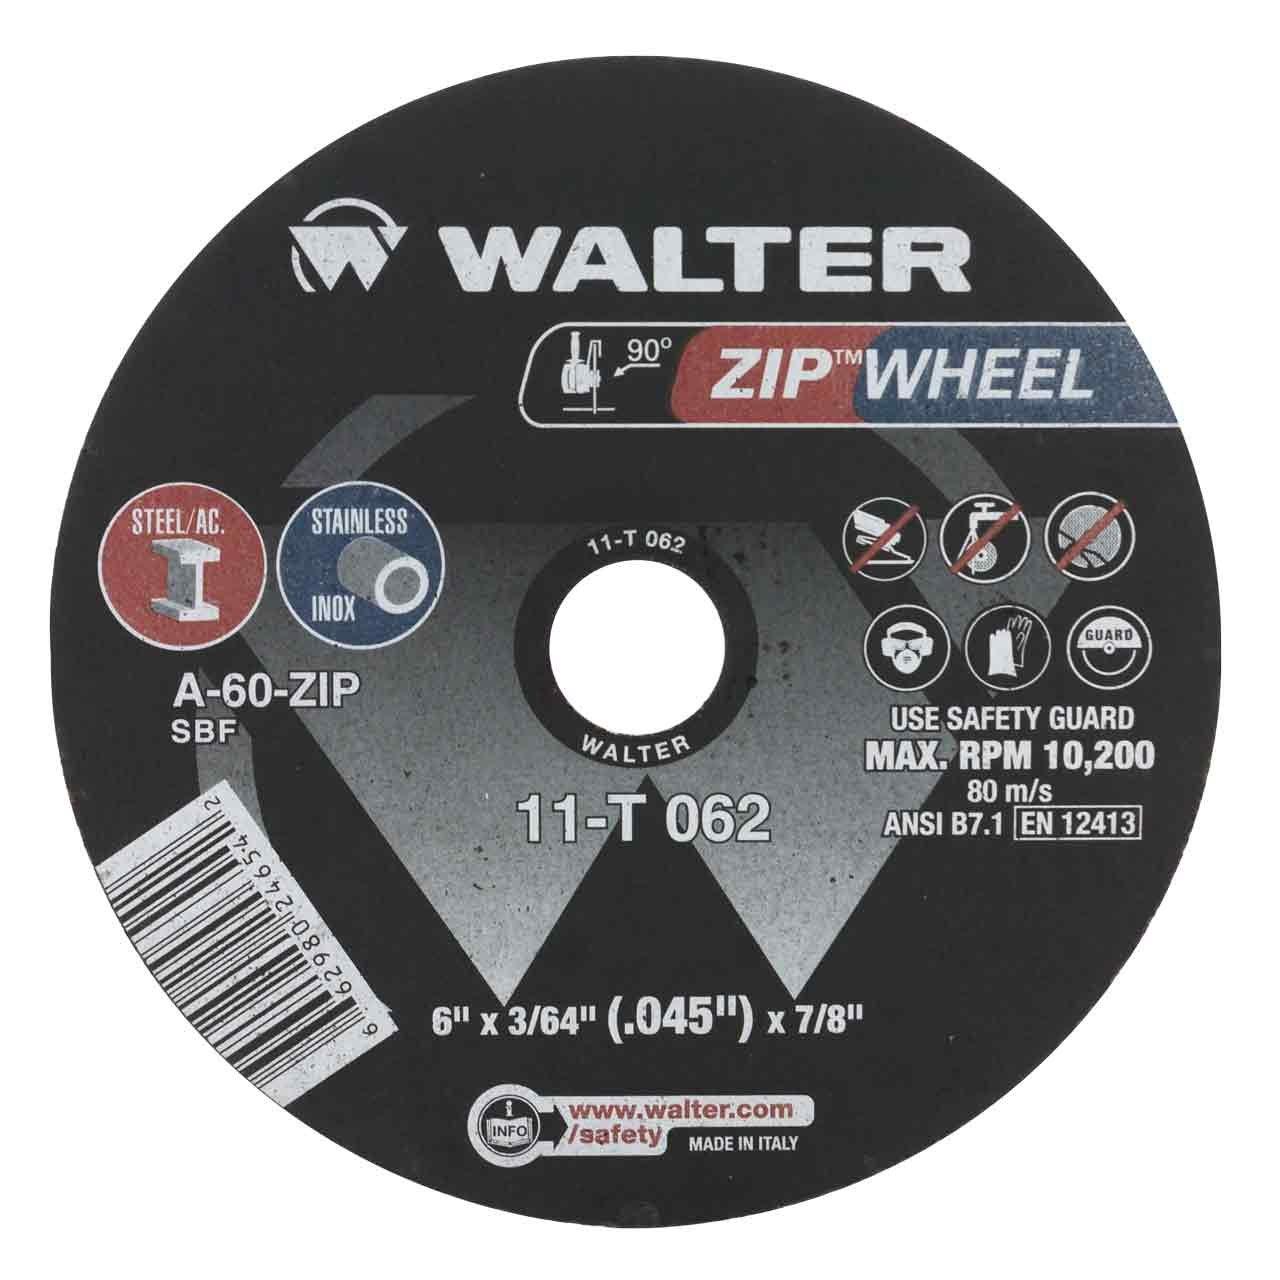 Walter 11T062 6x3/64x7/8 High Performance Zip Wheels Type 1 A60 Grit |